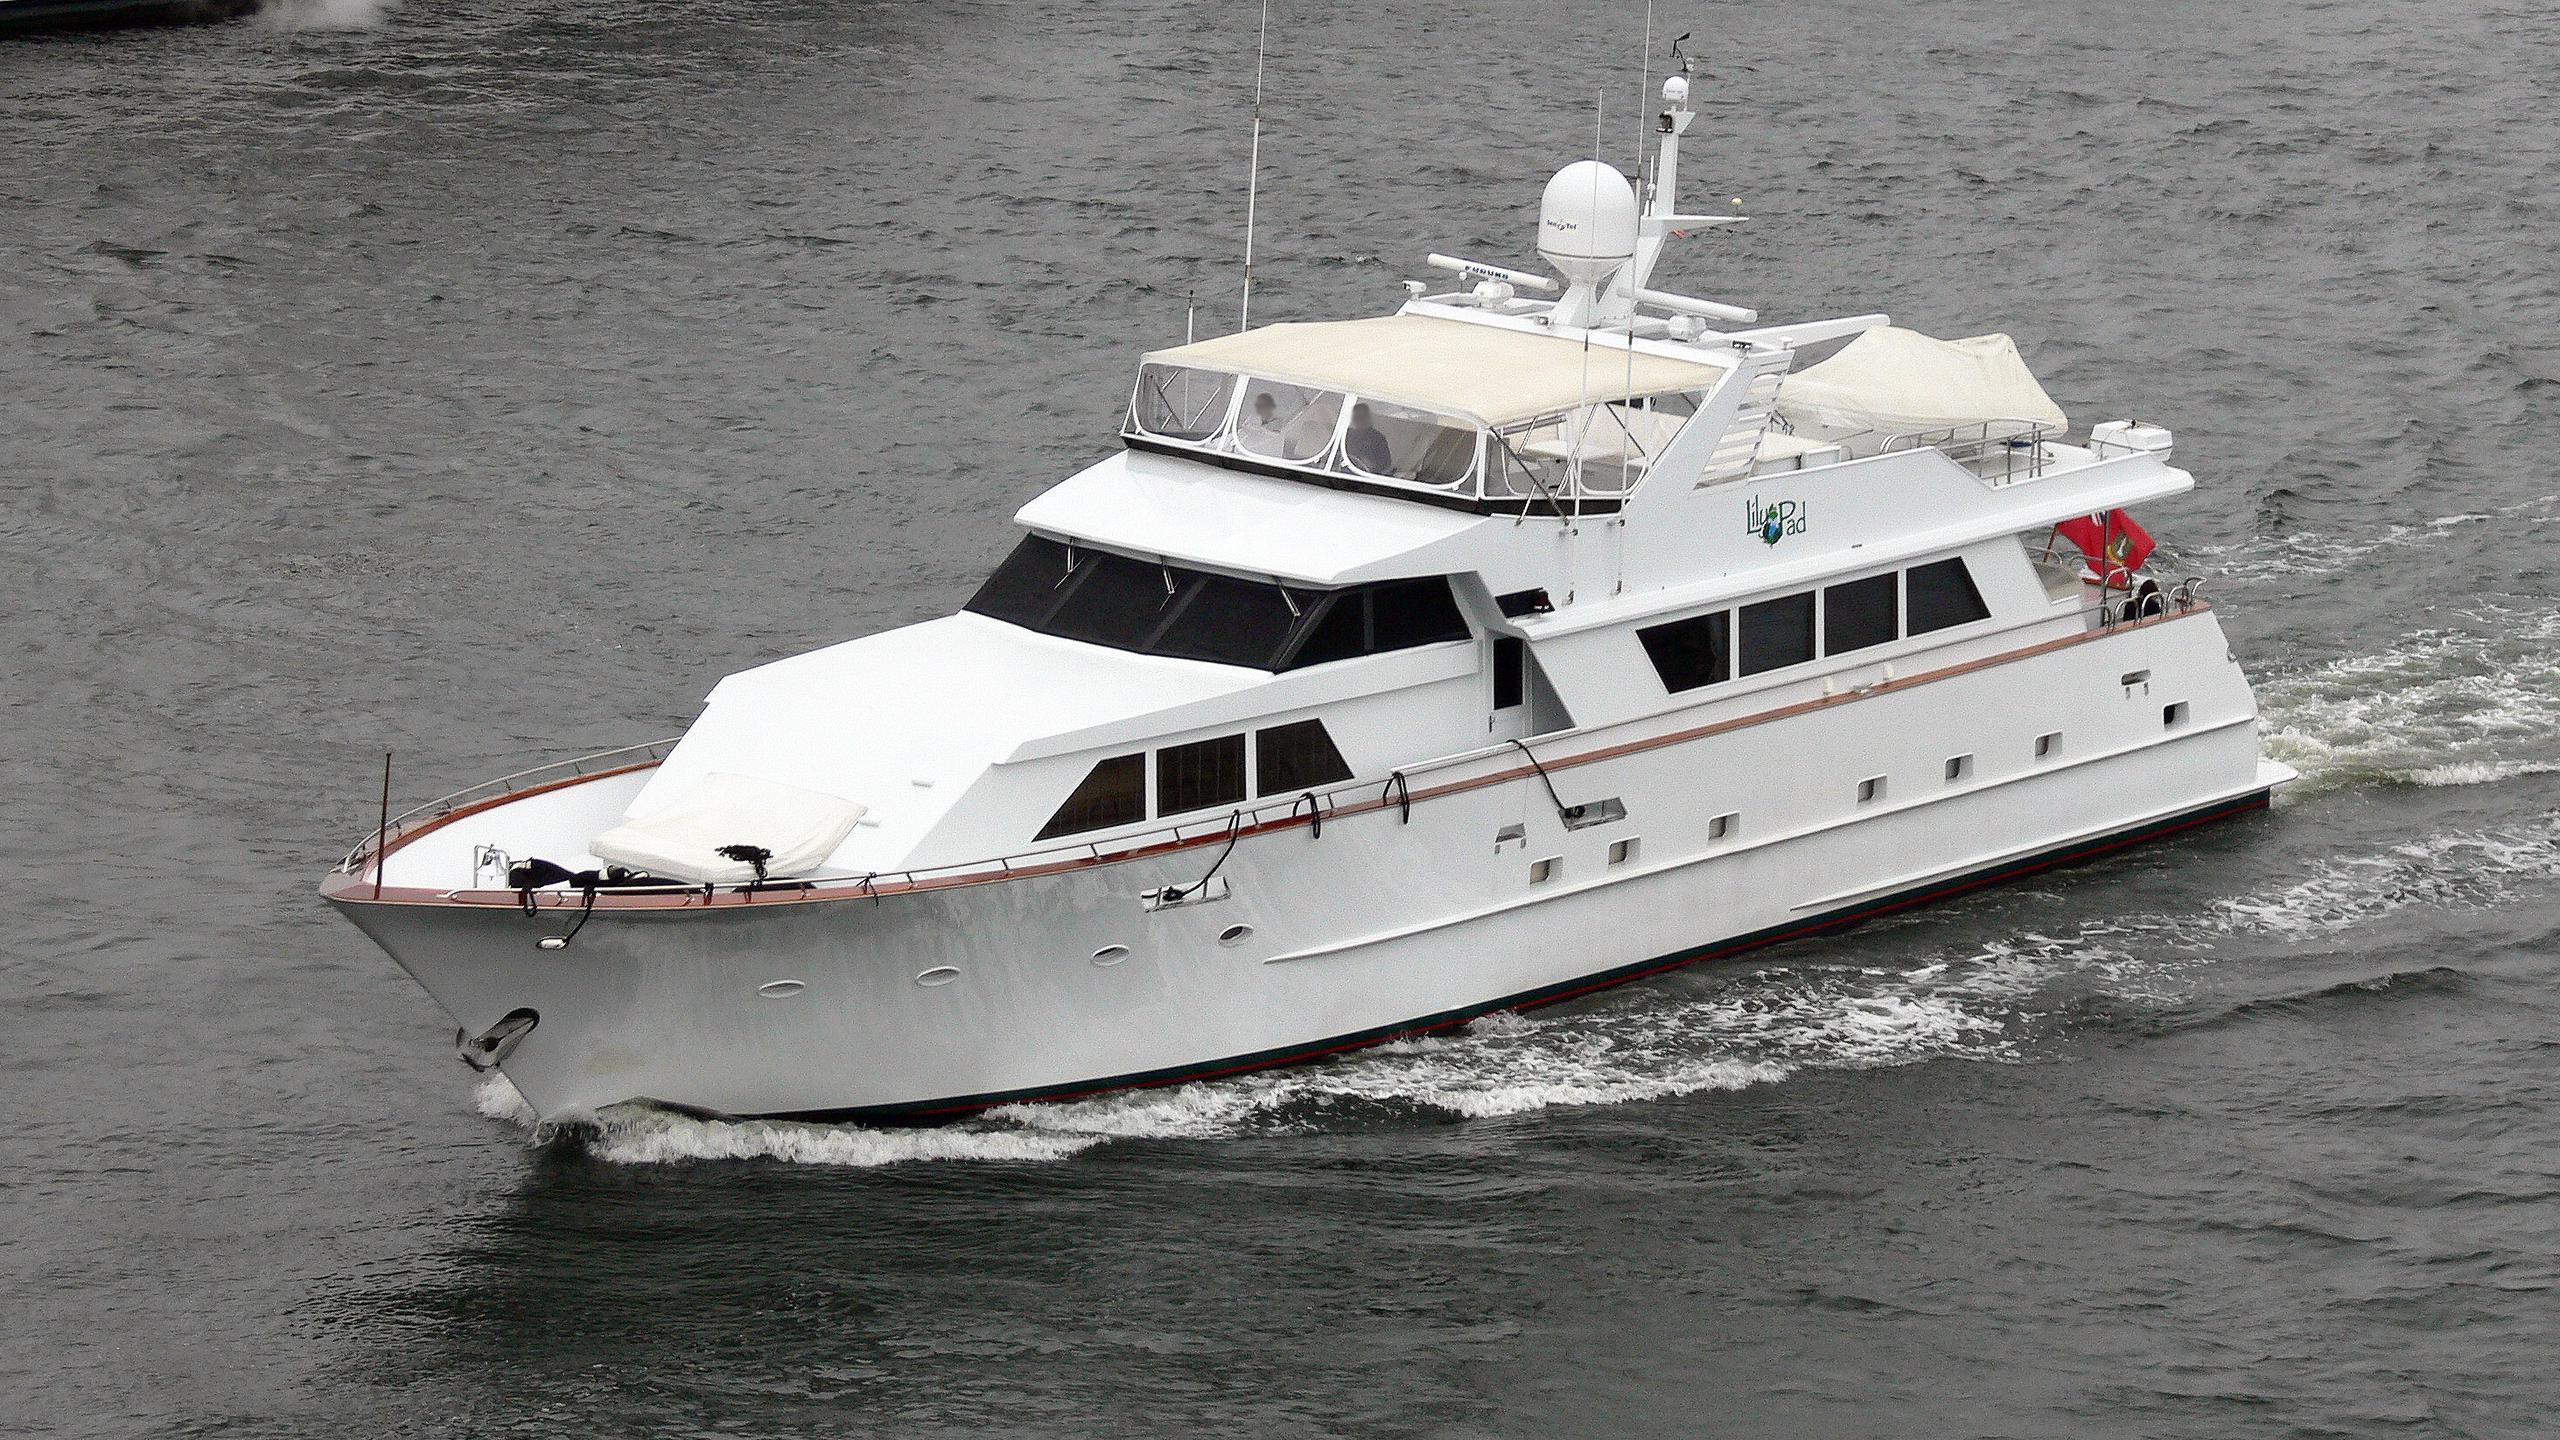 center-ring-golden-lady-motor-yacht-broward-1987-30m-cruising